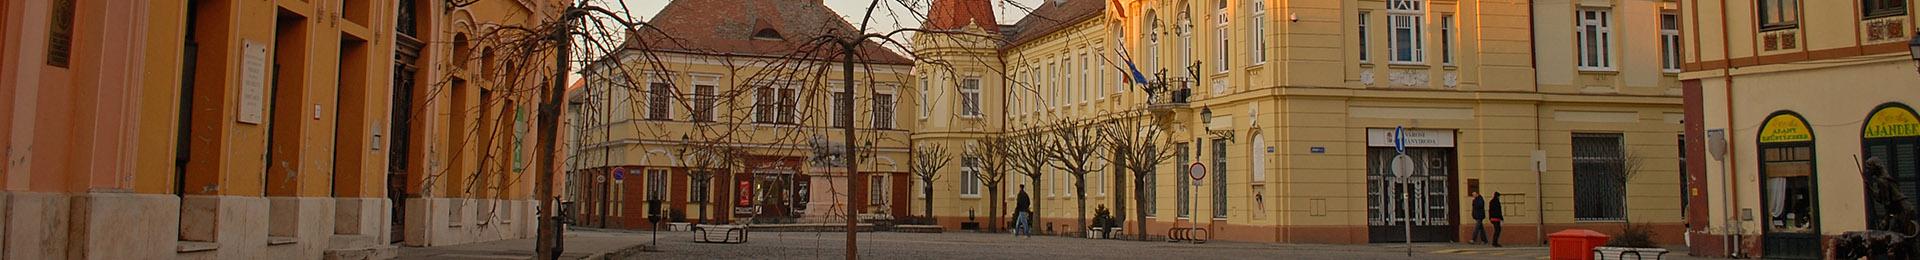 Trg Zrinskog